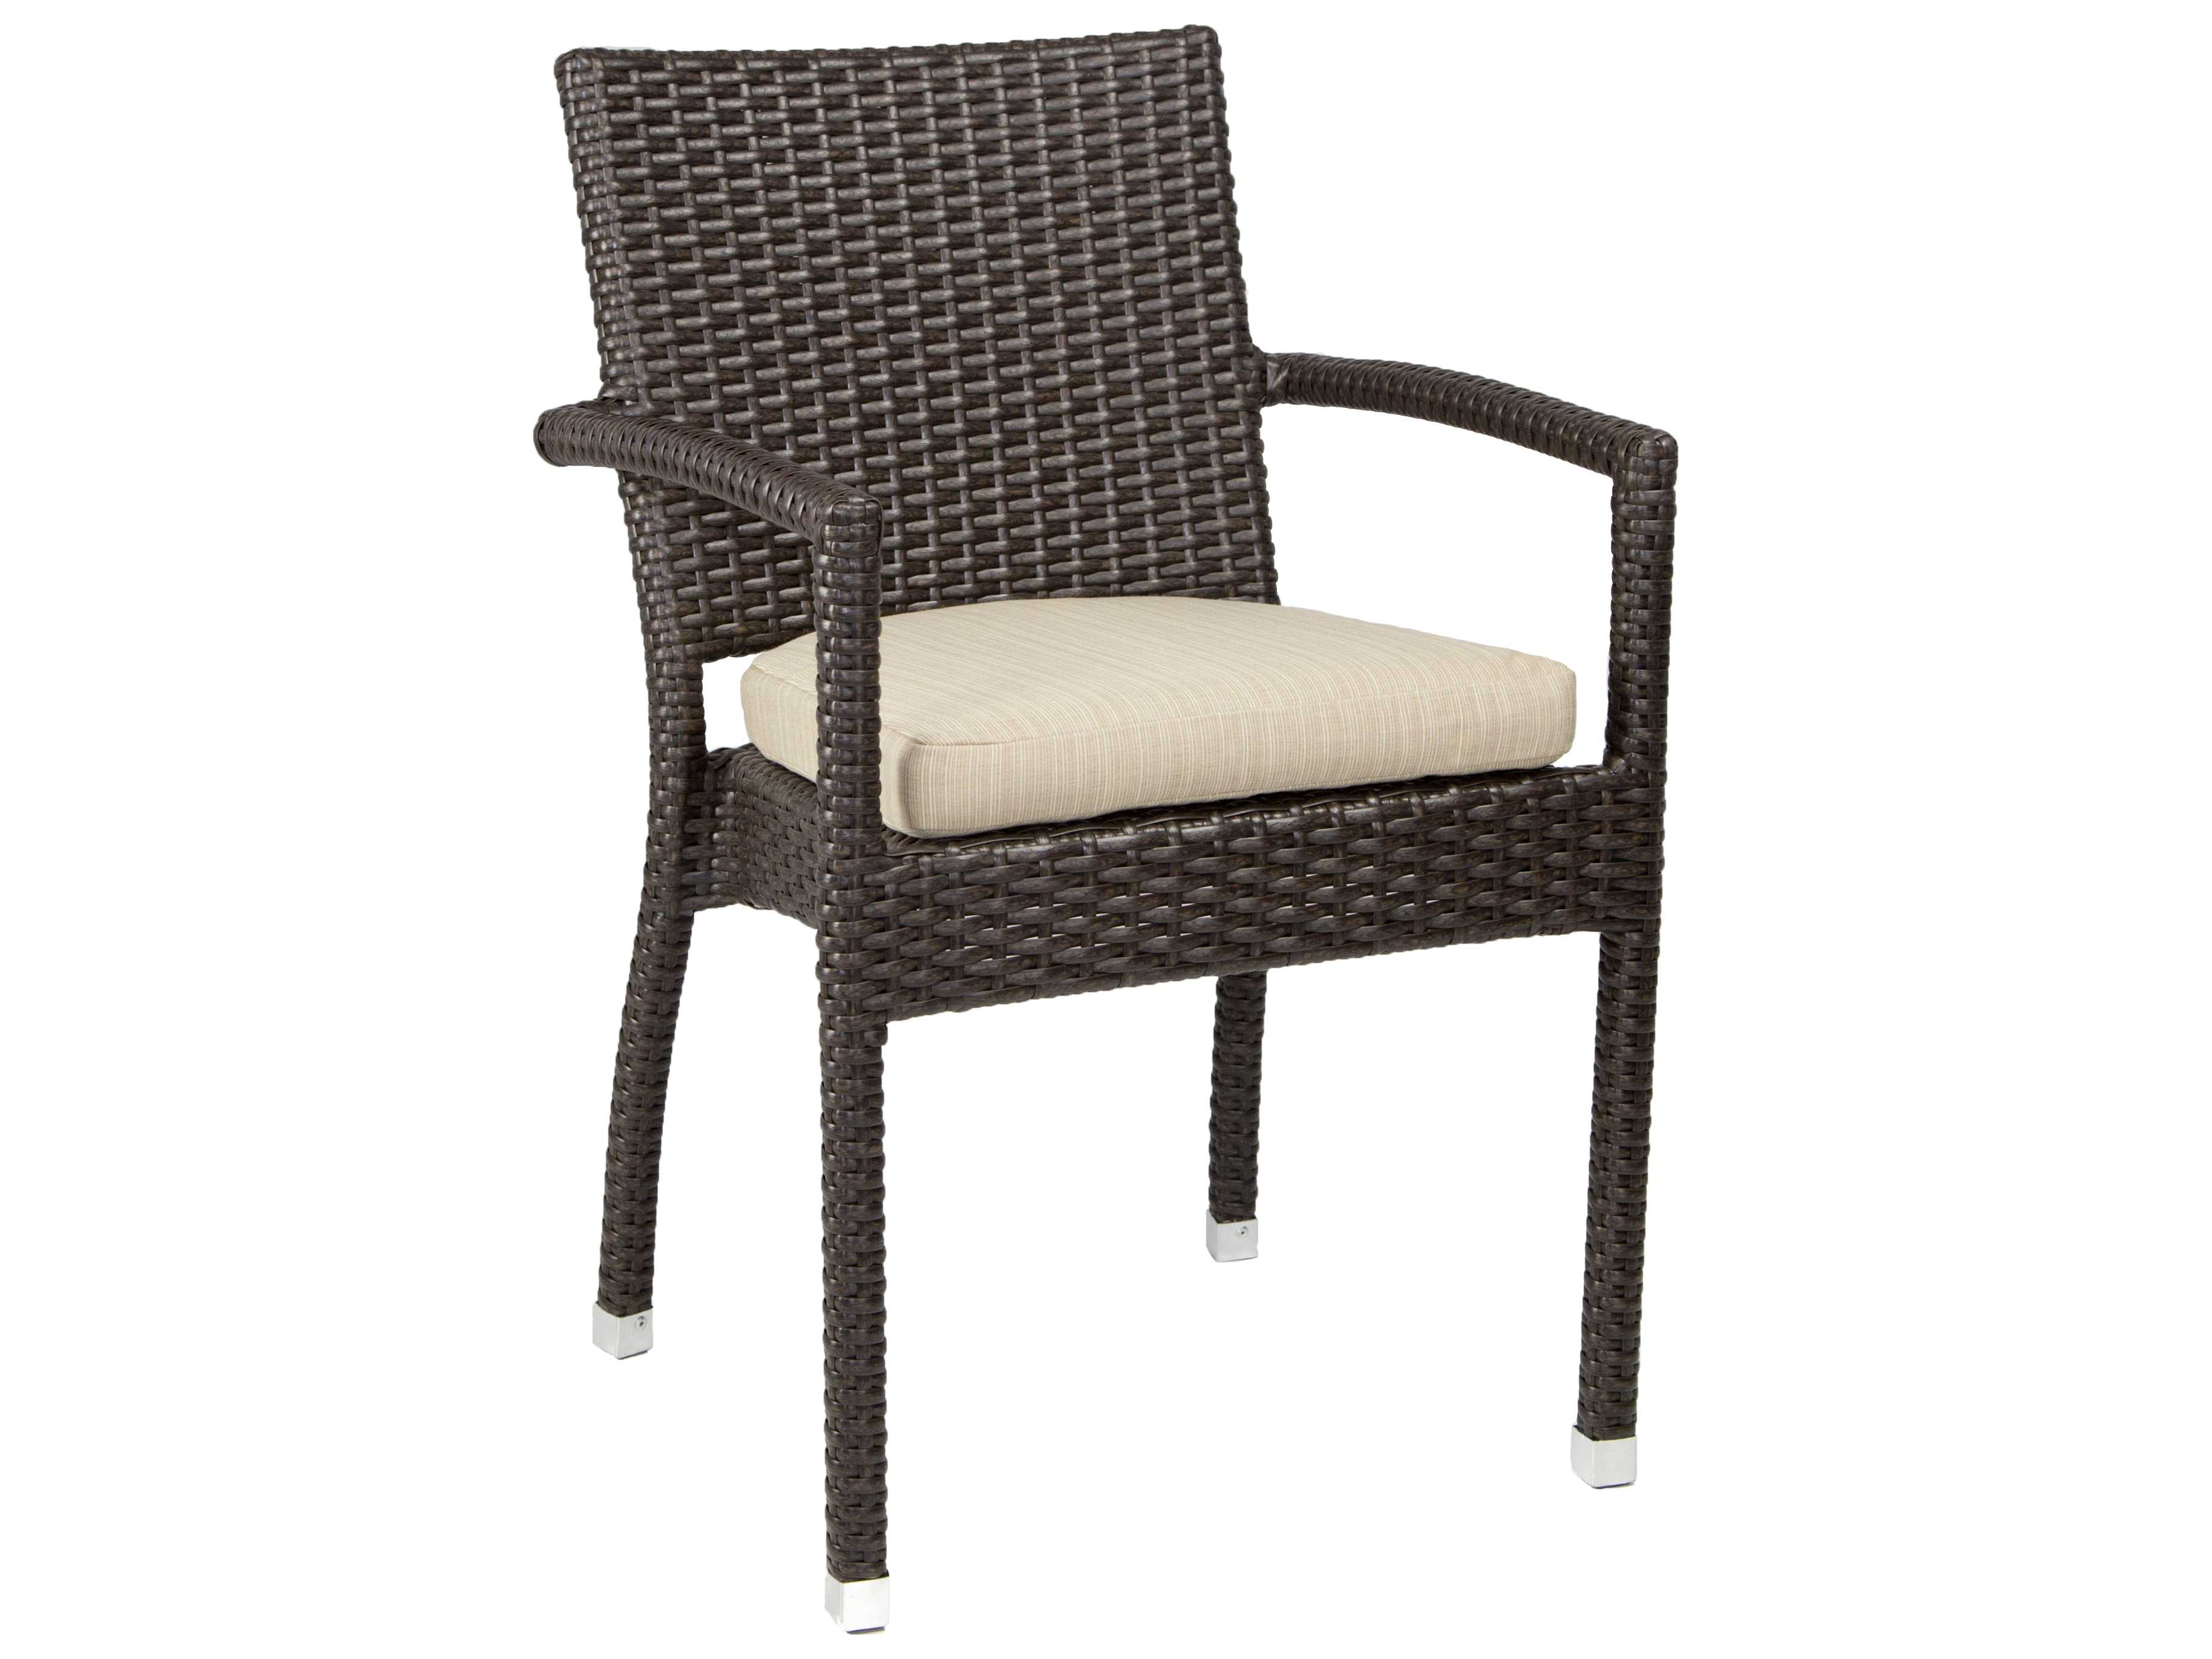 Patio heaven venice zuma wicker arm chair ph zac for Patio heaven